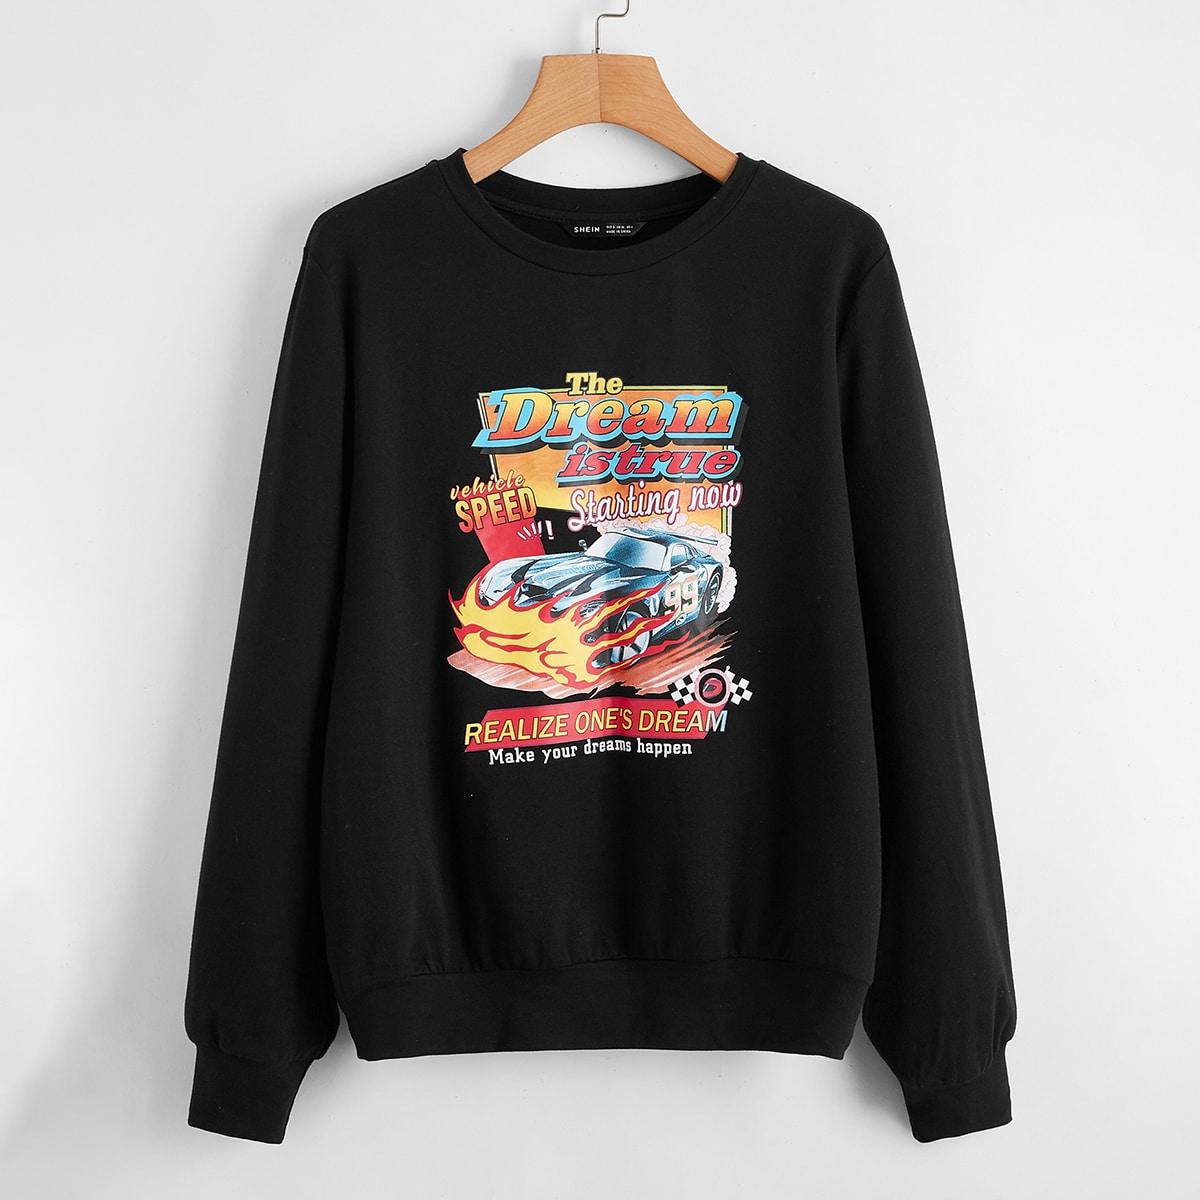 SHEIN / Slogan and Car Print Sweatshirt